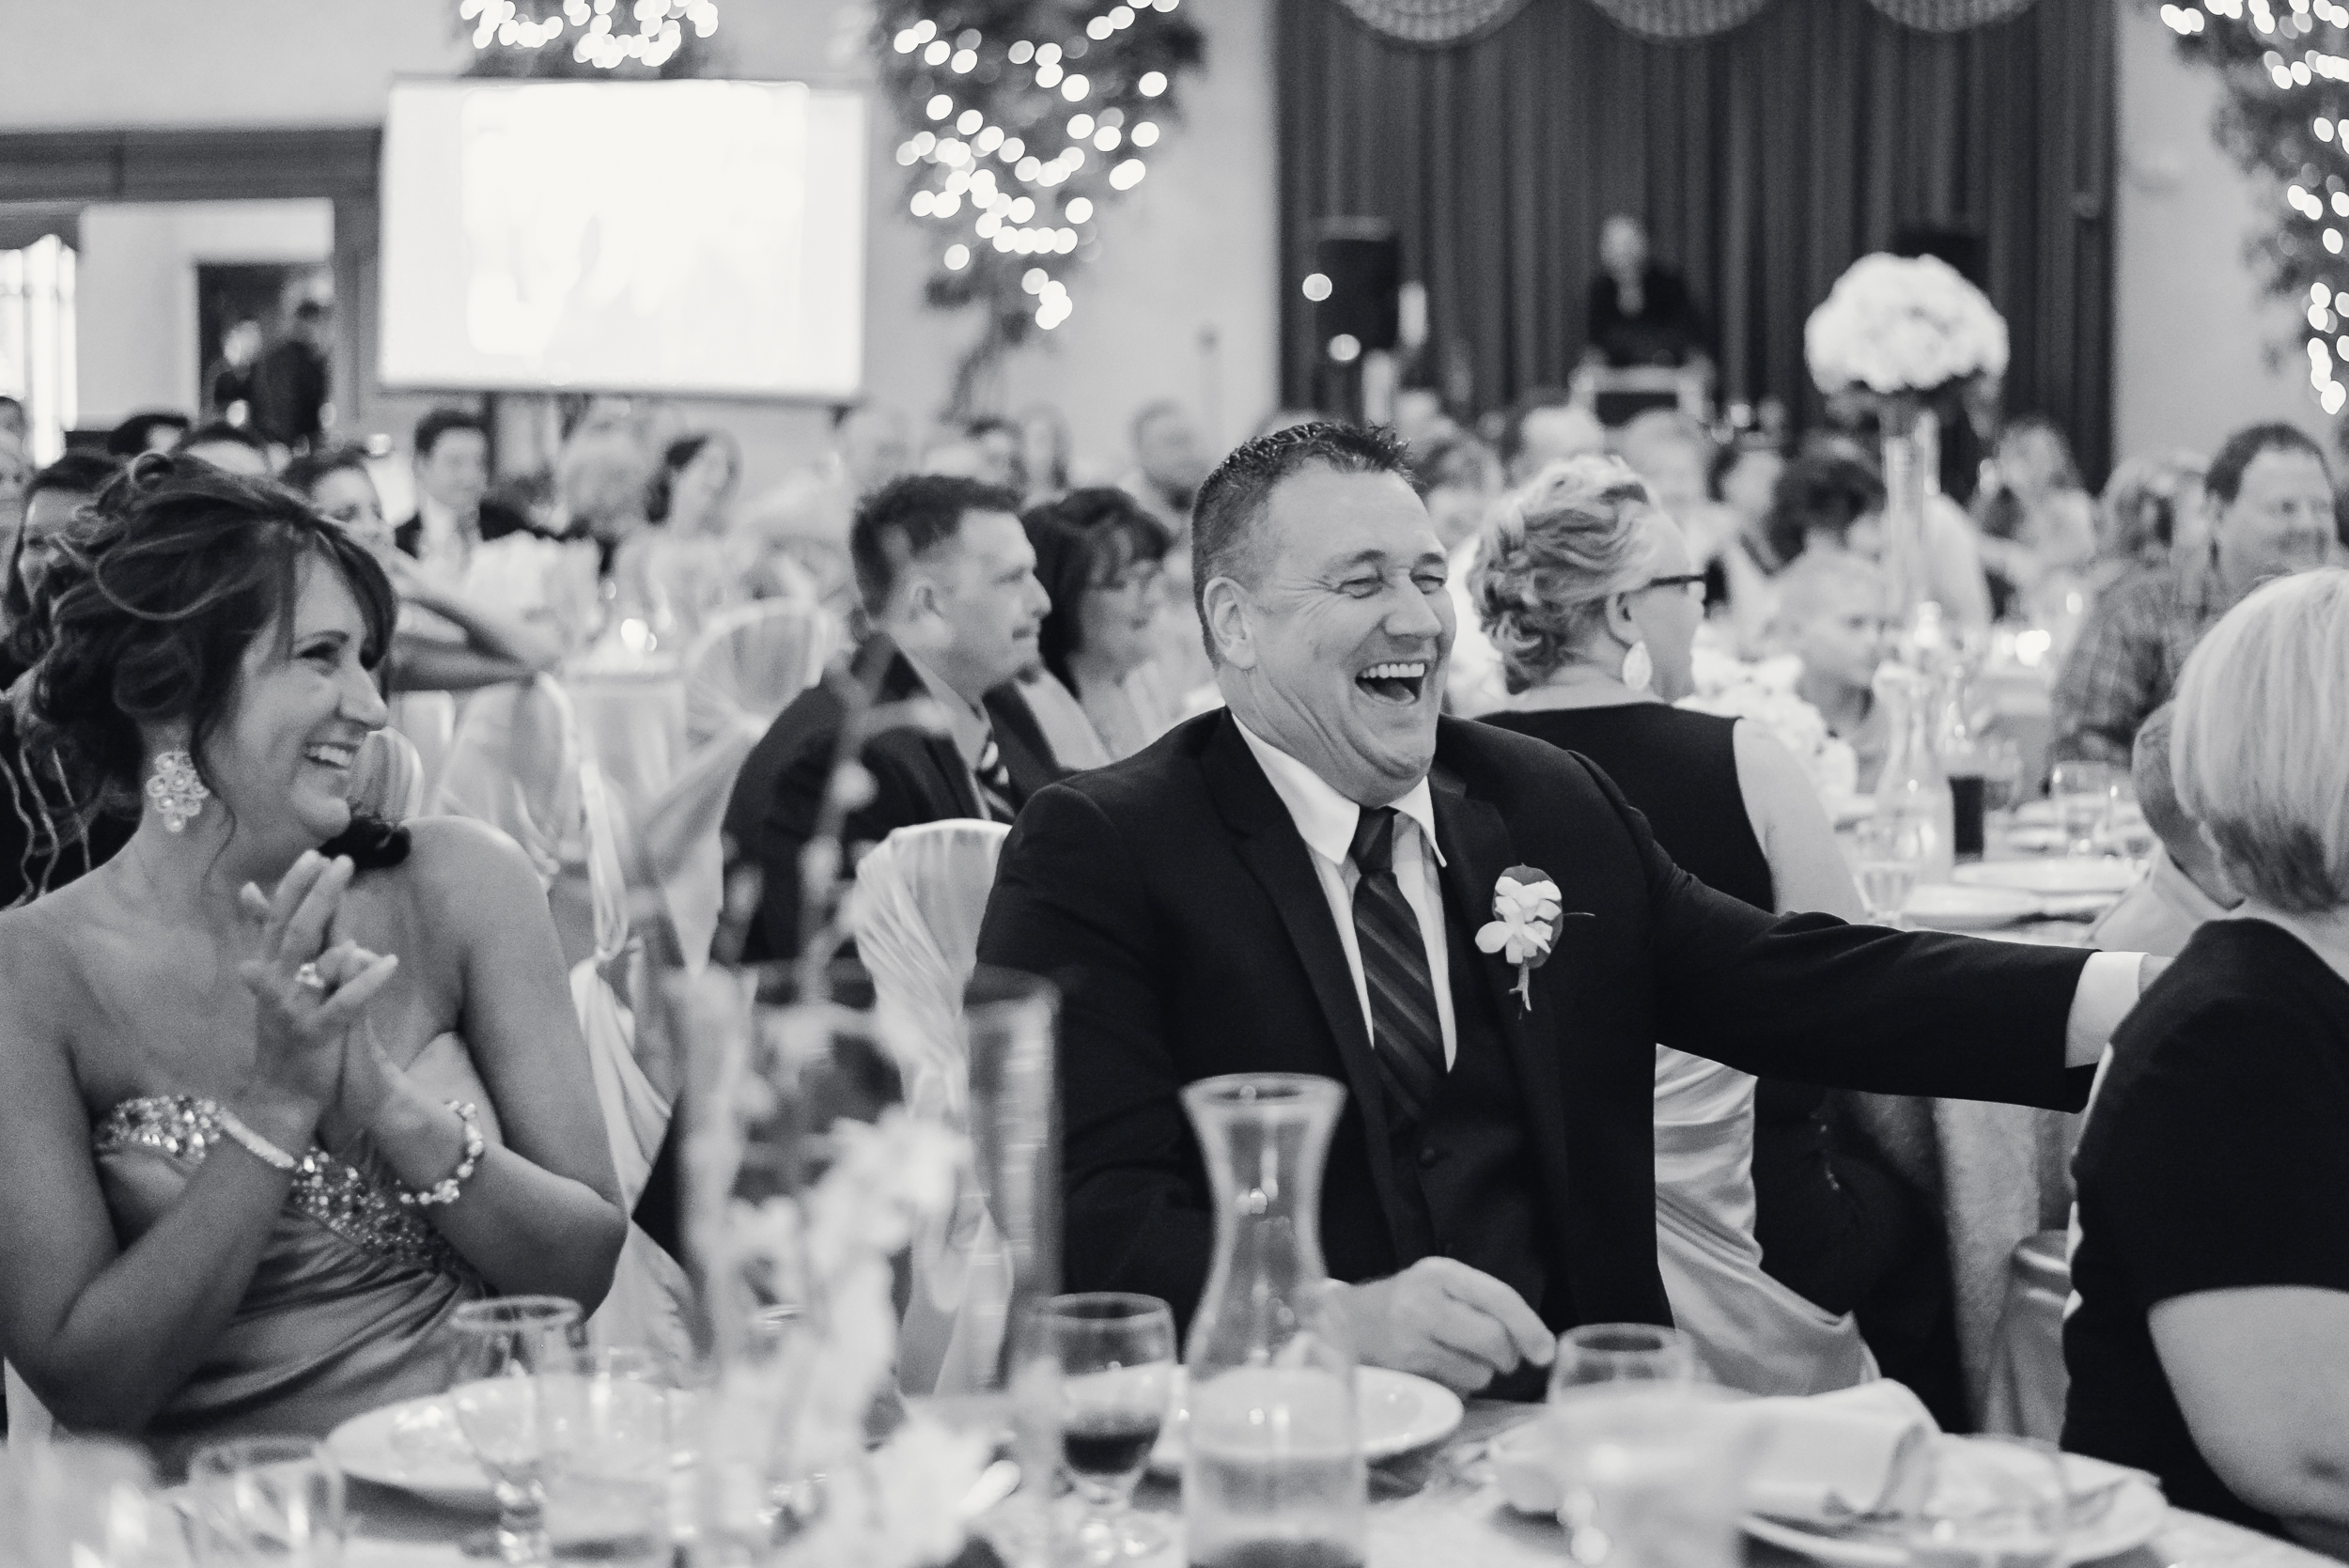 crystal-gardens-southgate-michigan-wedding-photo-1-16